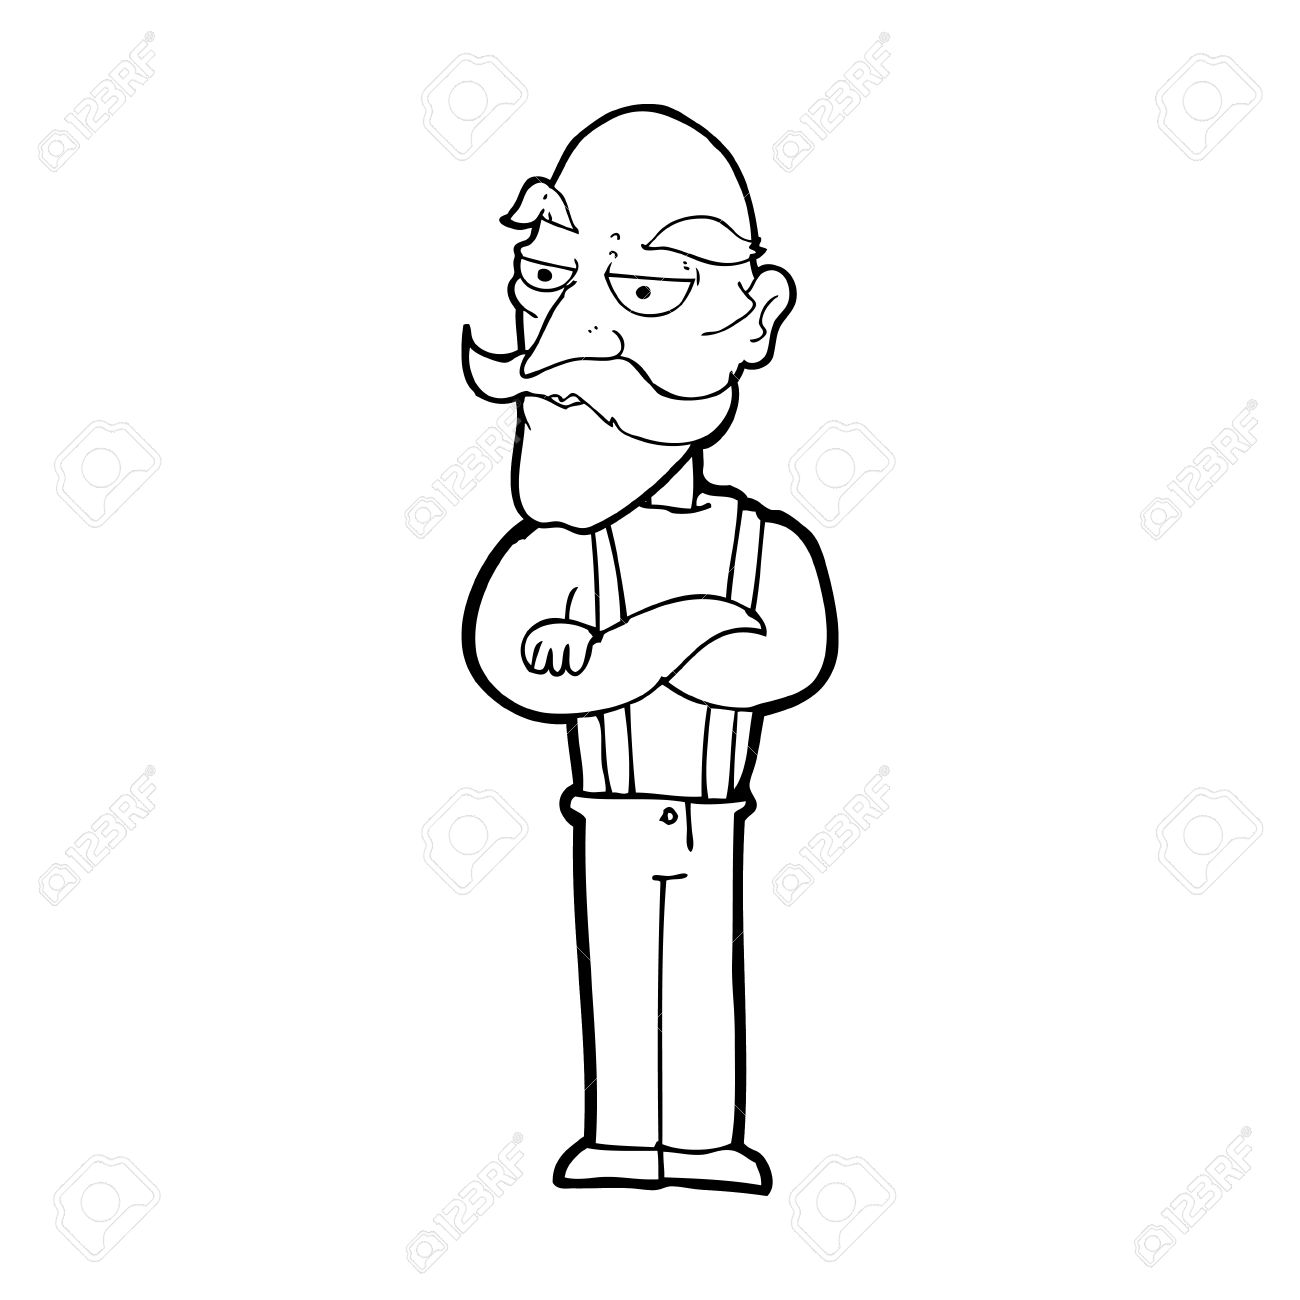 1300x1300 Cartoon Bored Old Man Royalty Free Cliparts, Vectors, And Stock